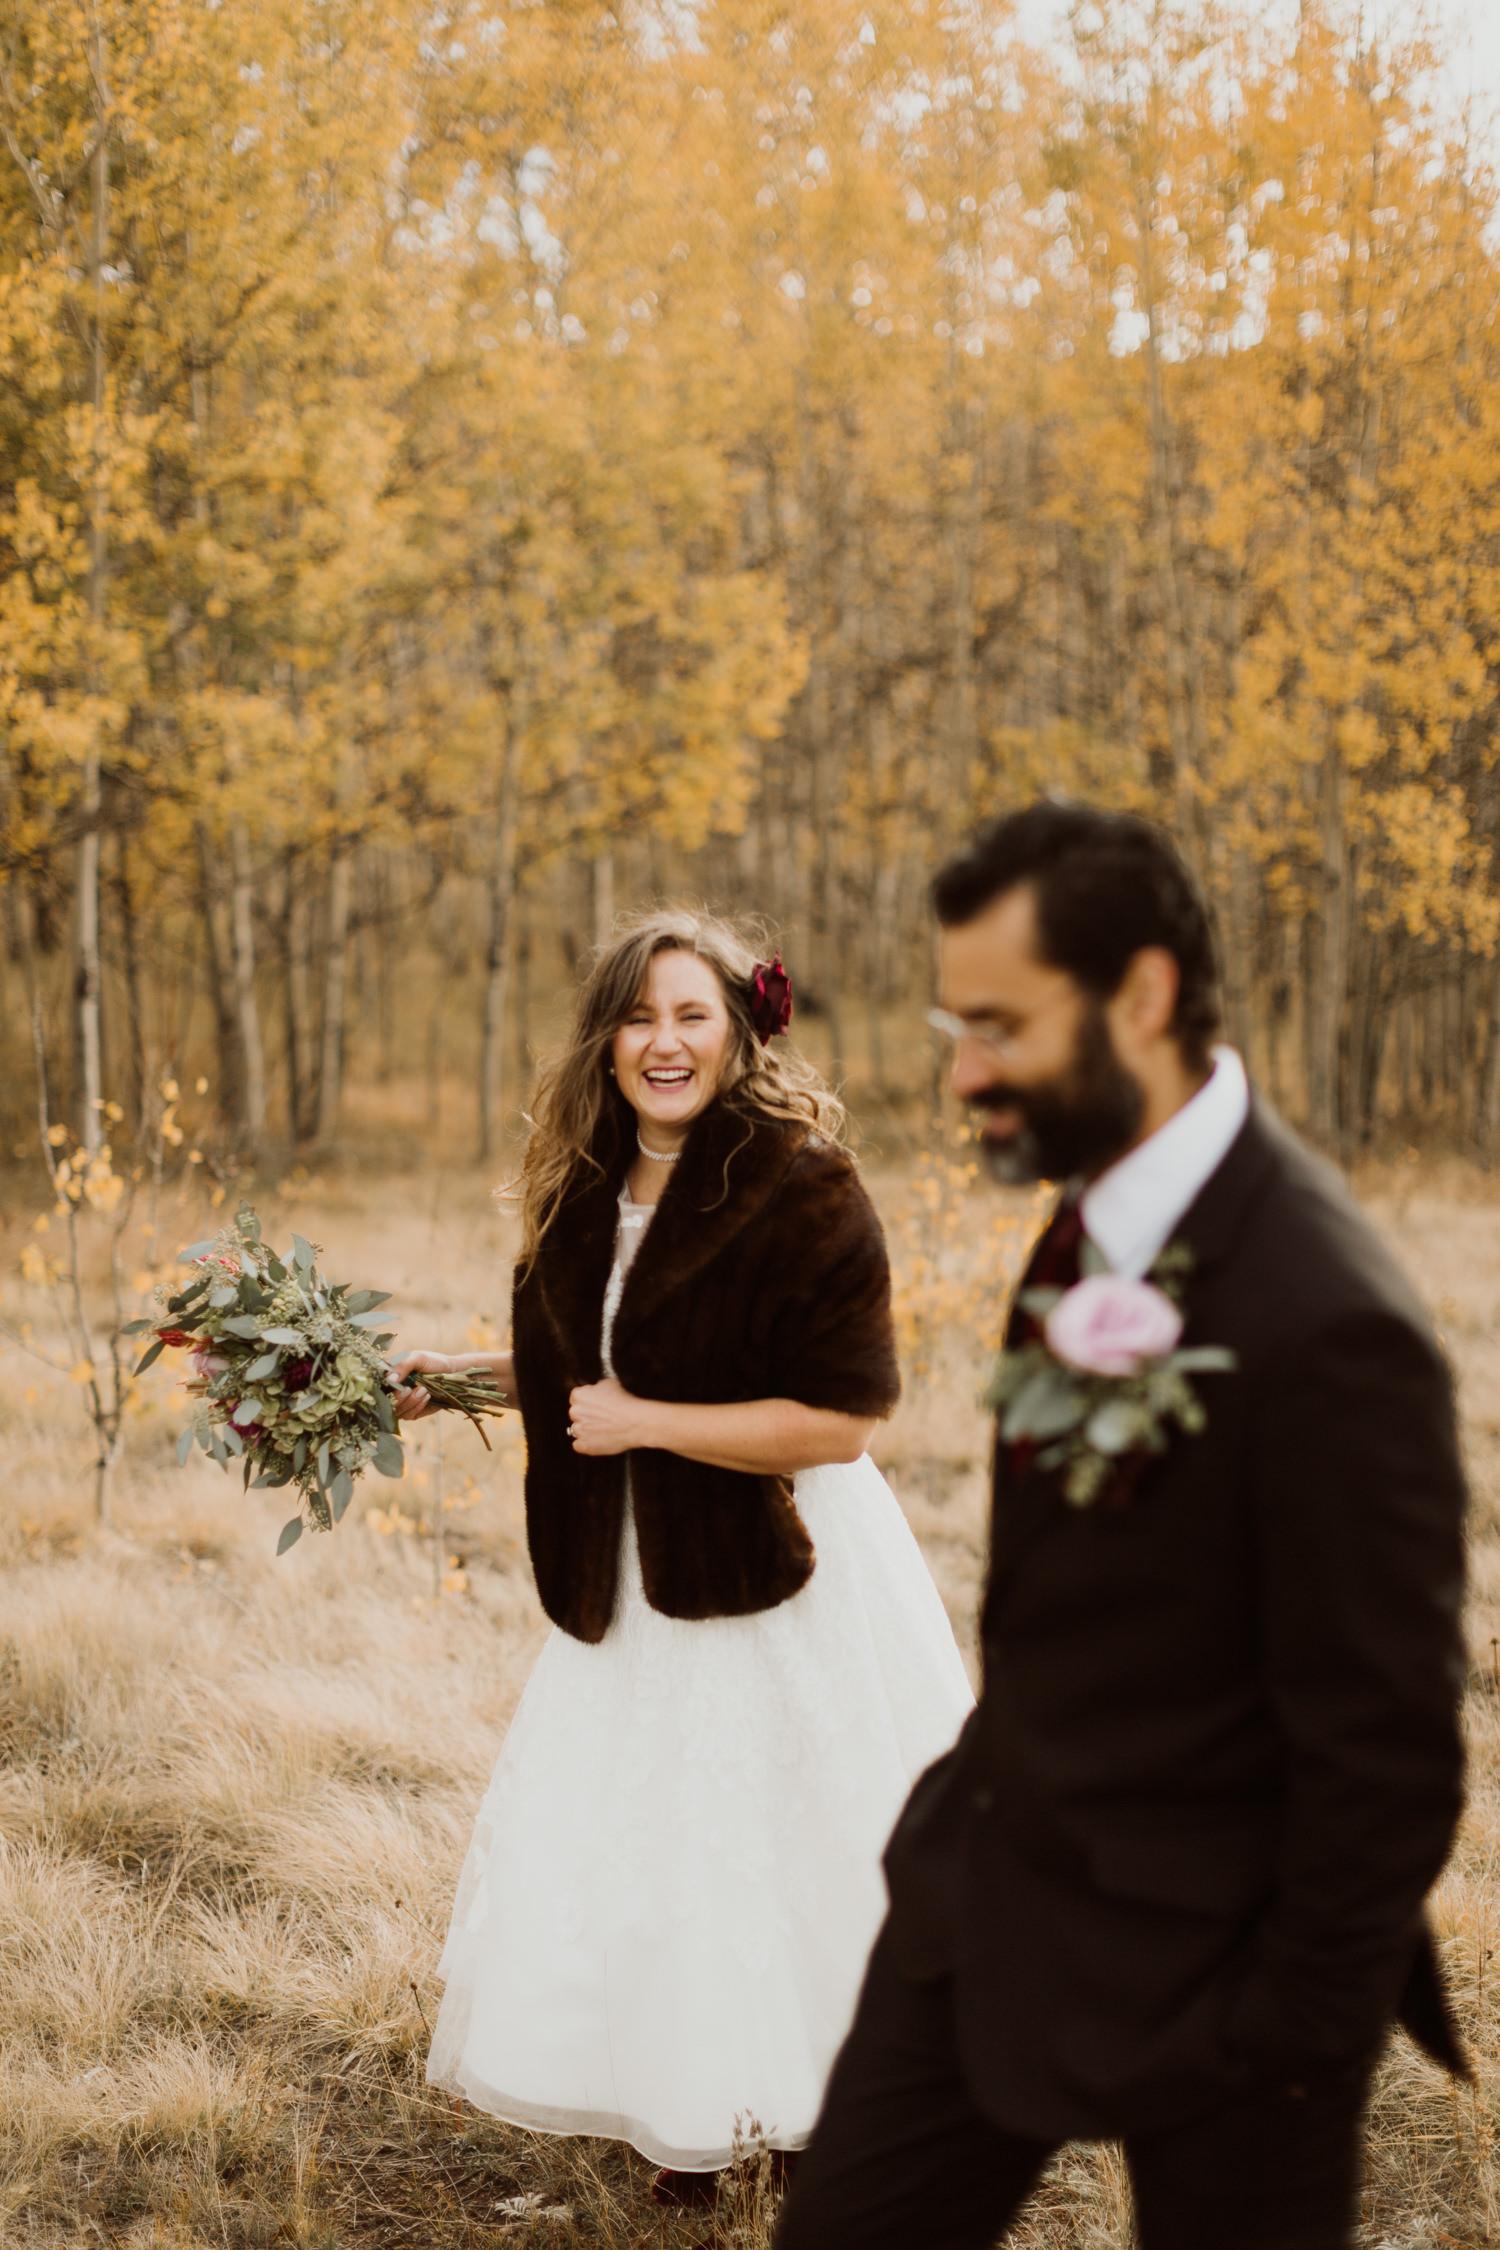 colorado-elopement-photographer-buena-vista-35.jpg